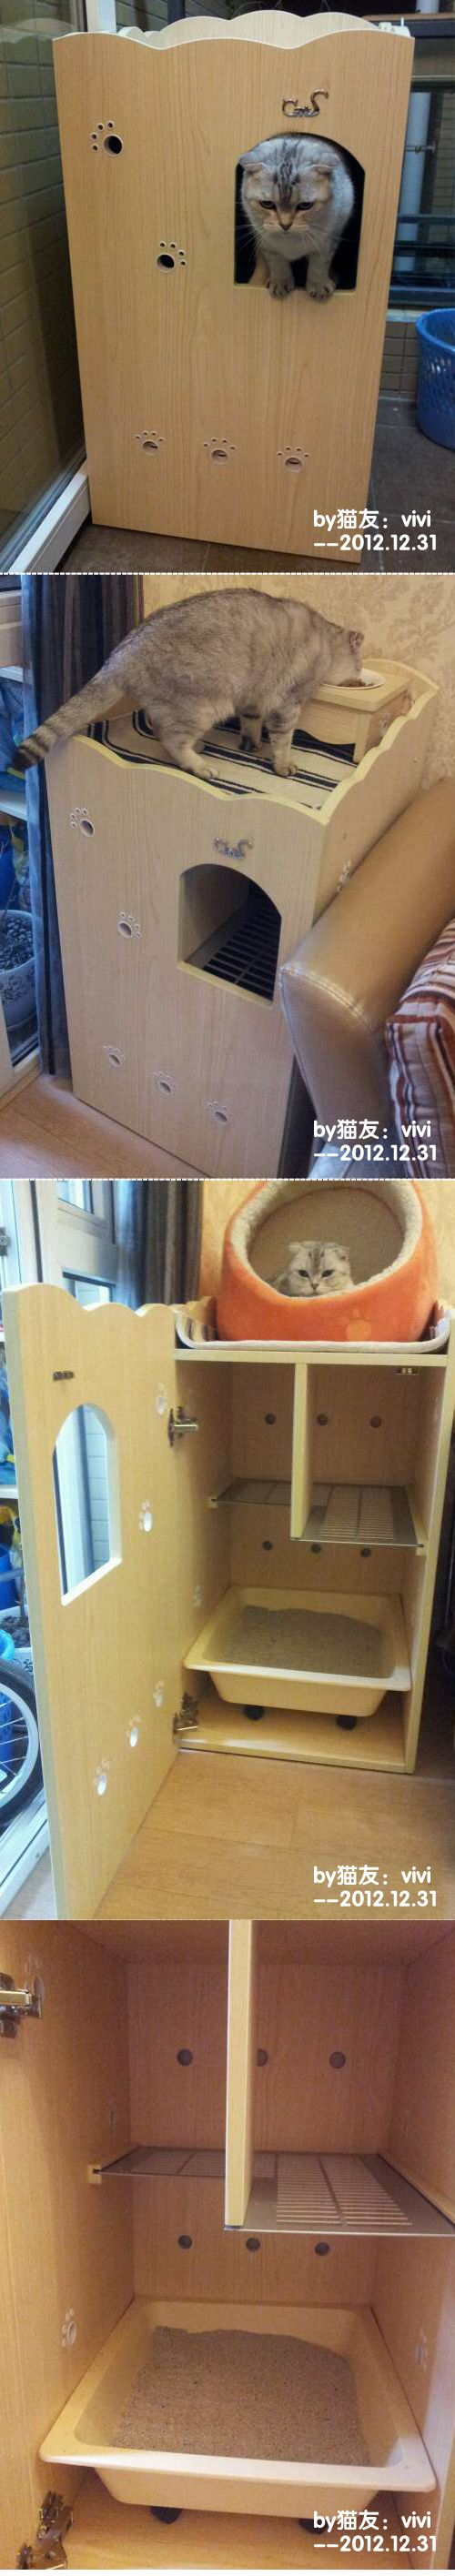 Cat Litter Box_Cat Litter Box & its tree_幸福的猫生活-CatS